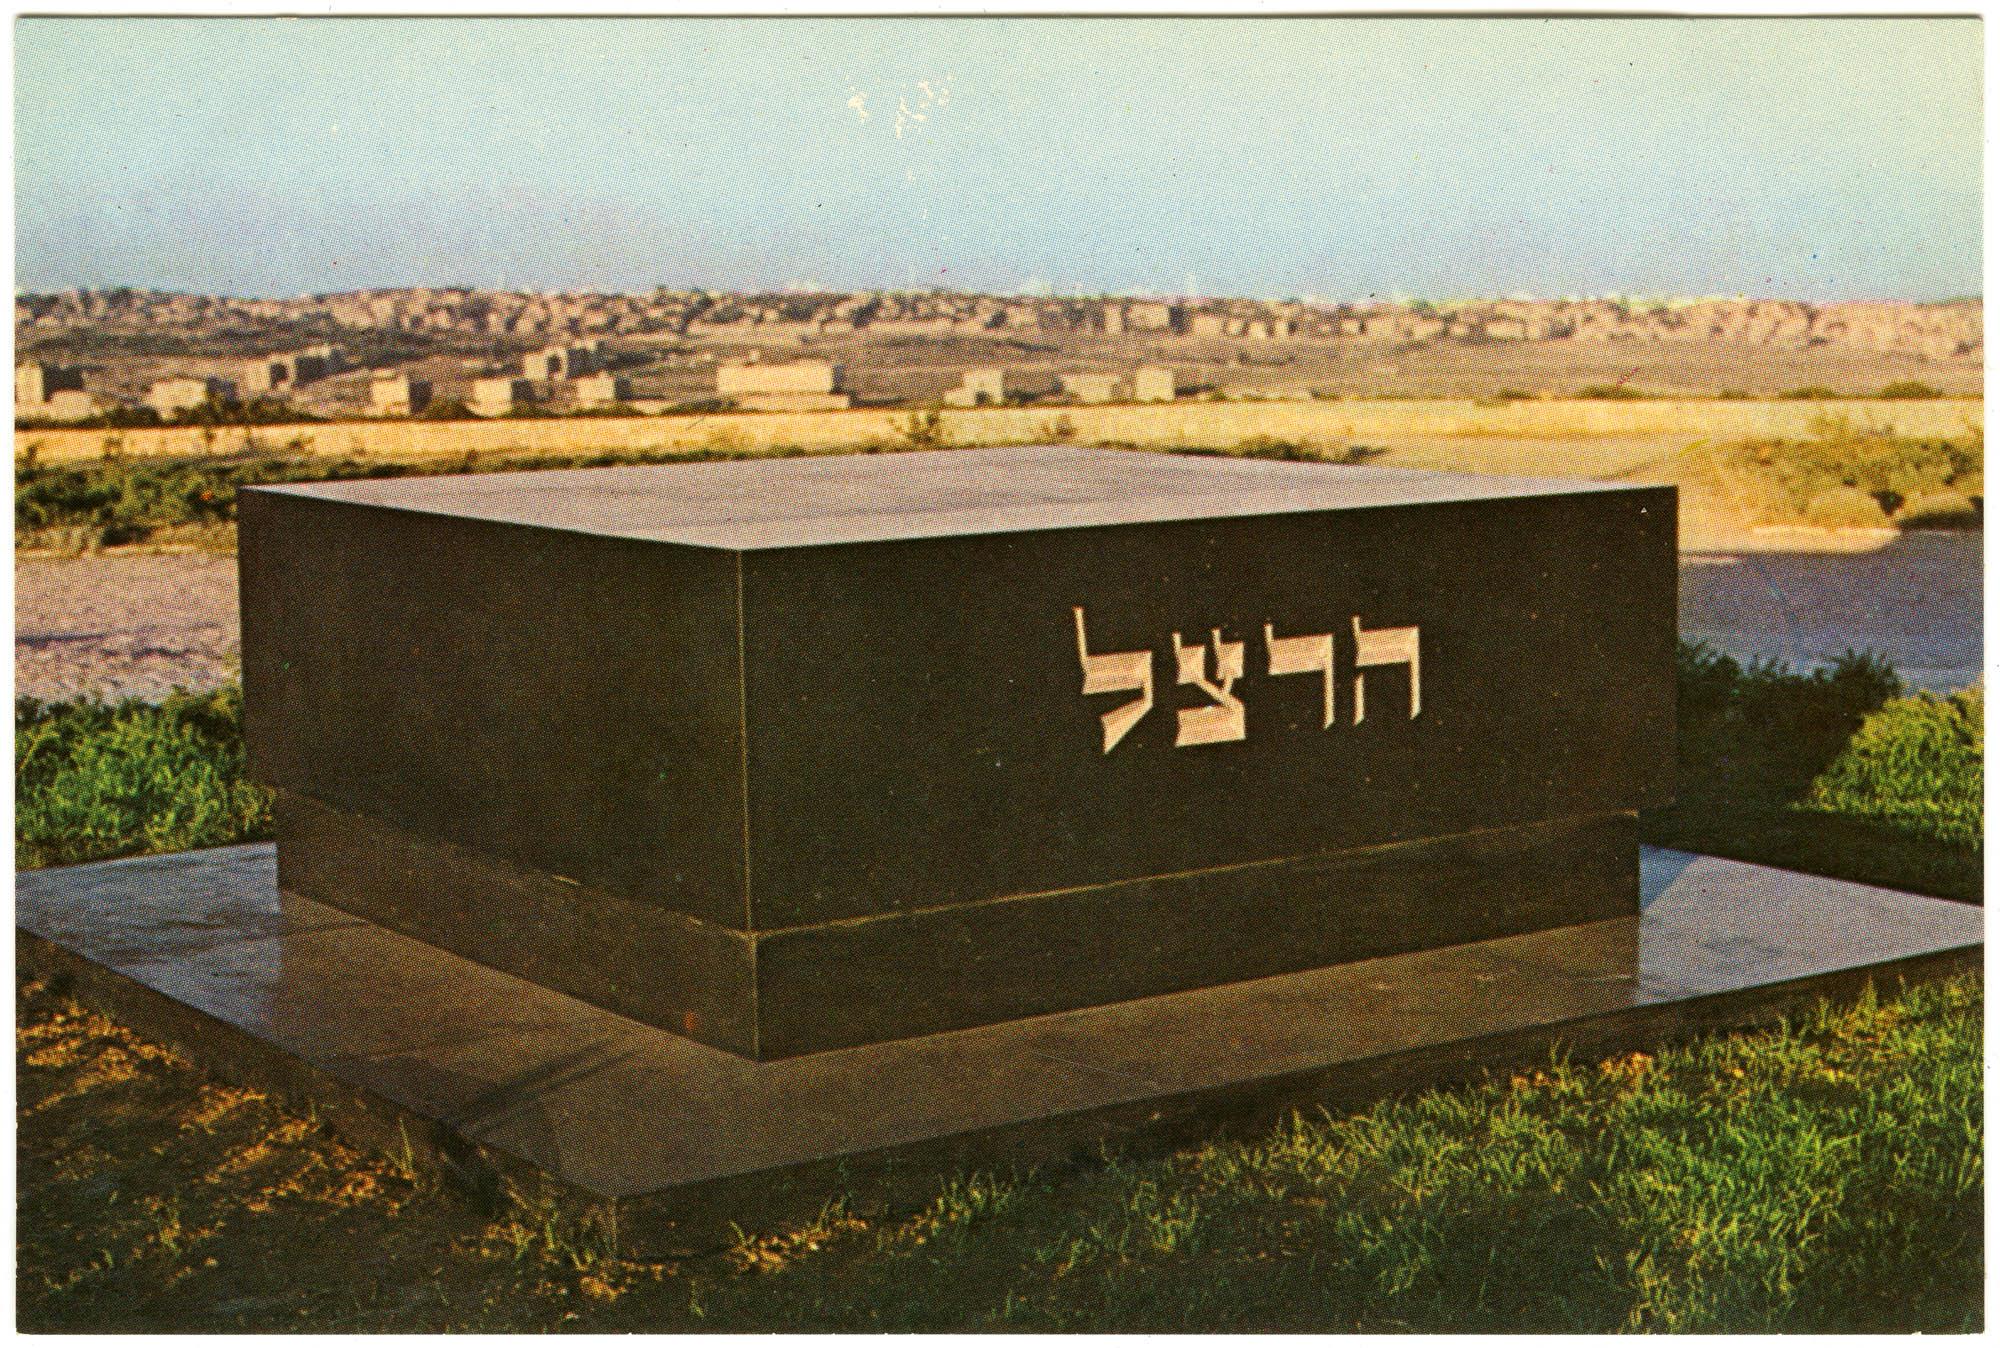 Jerusalem - Tomb of Herzl / ירושלים - קבר הרצל